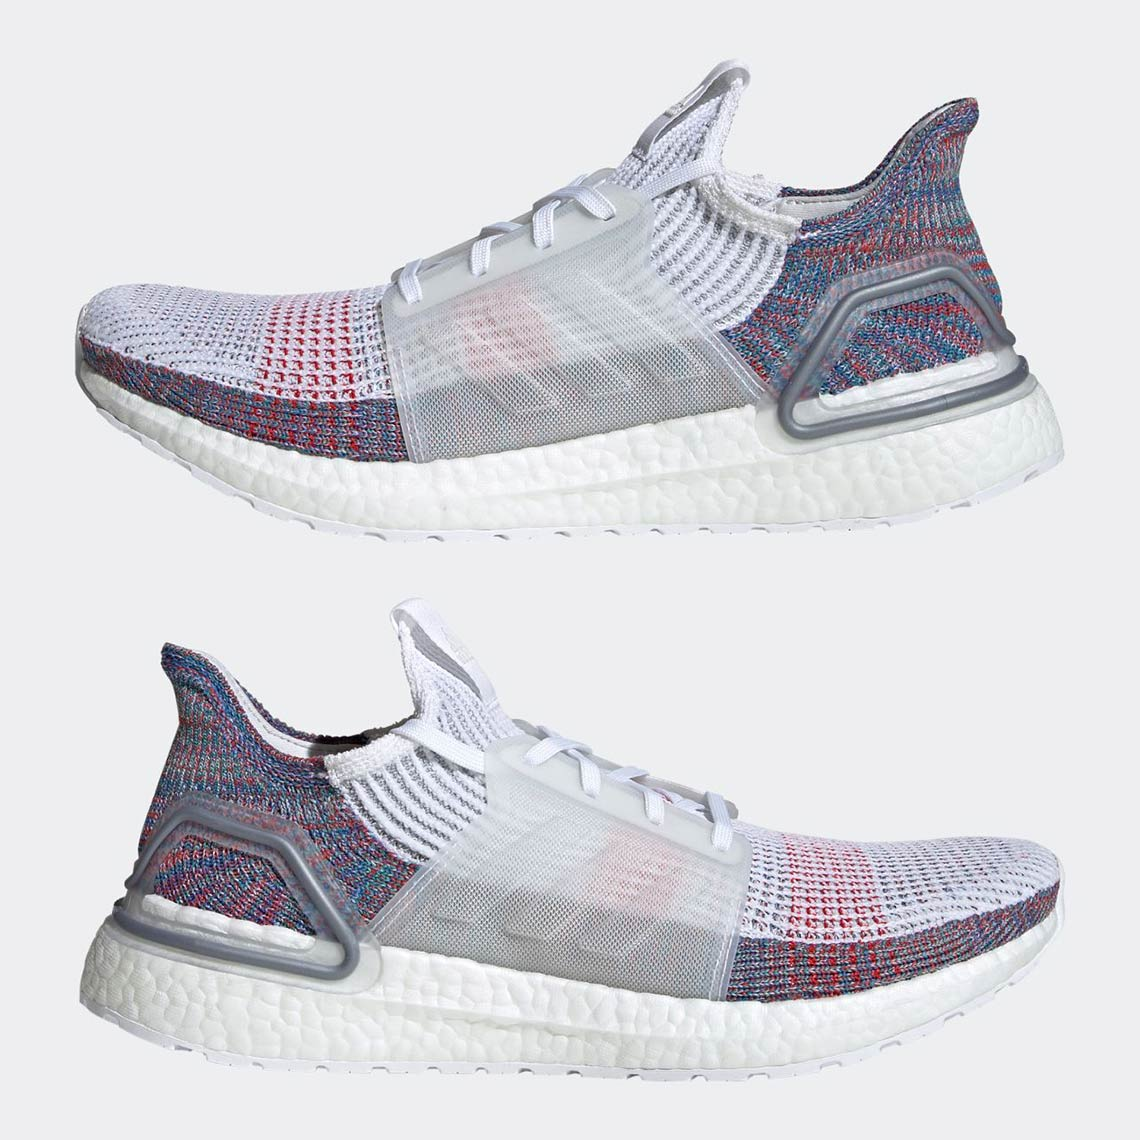 55a8c3085ab adidas Ultra Boost 2019 Multi-Color B37708 Info